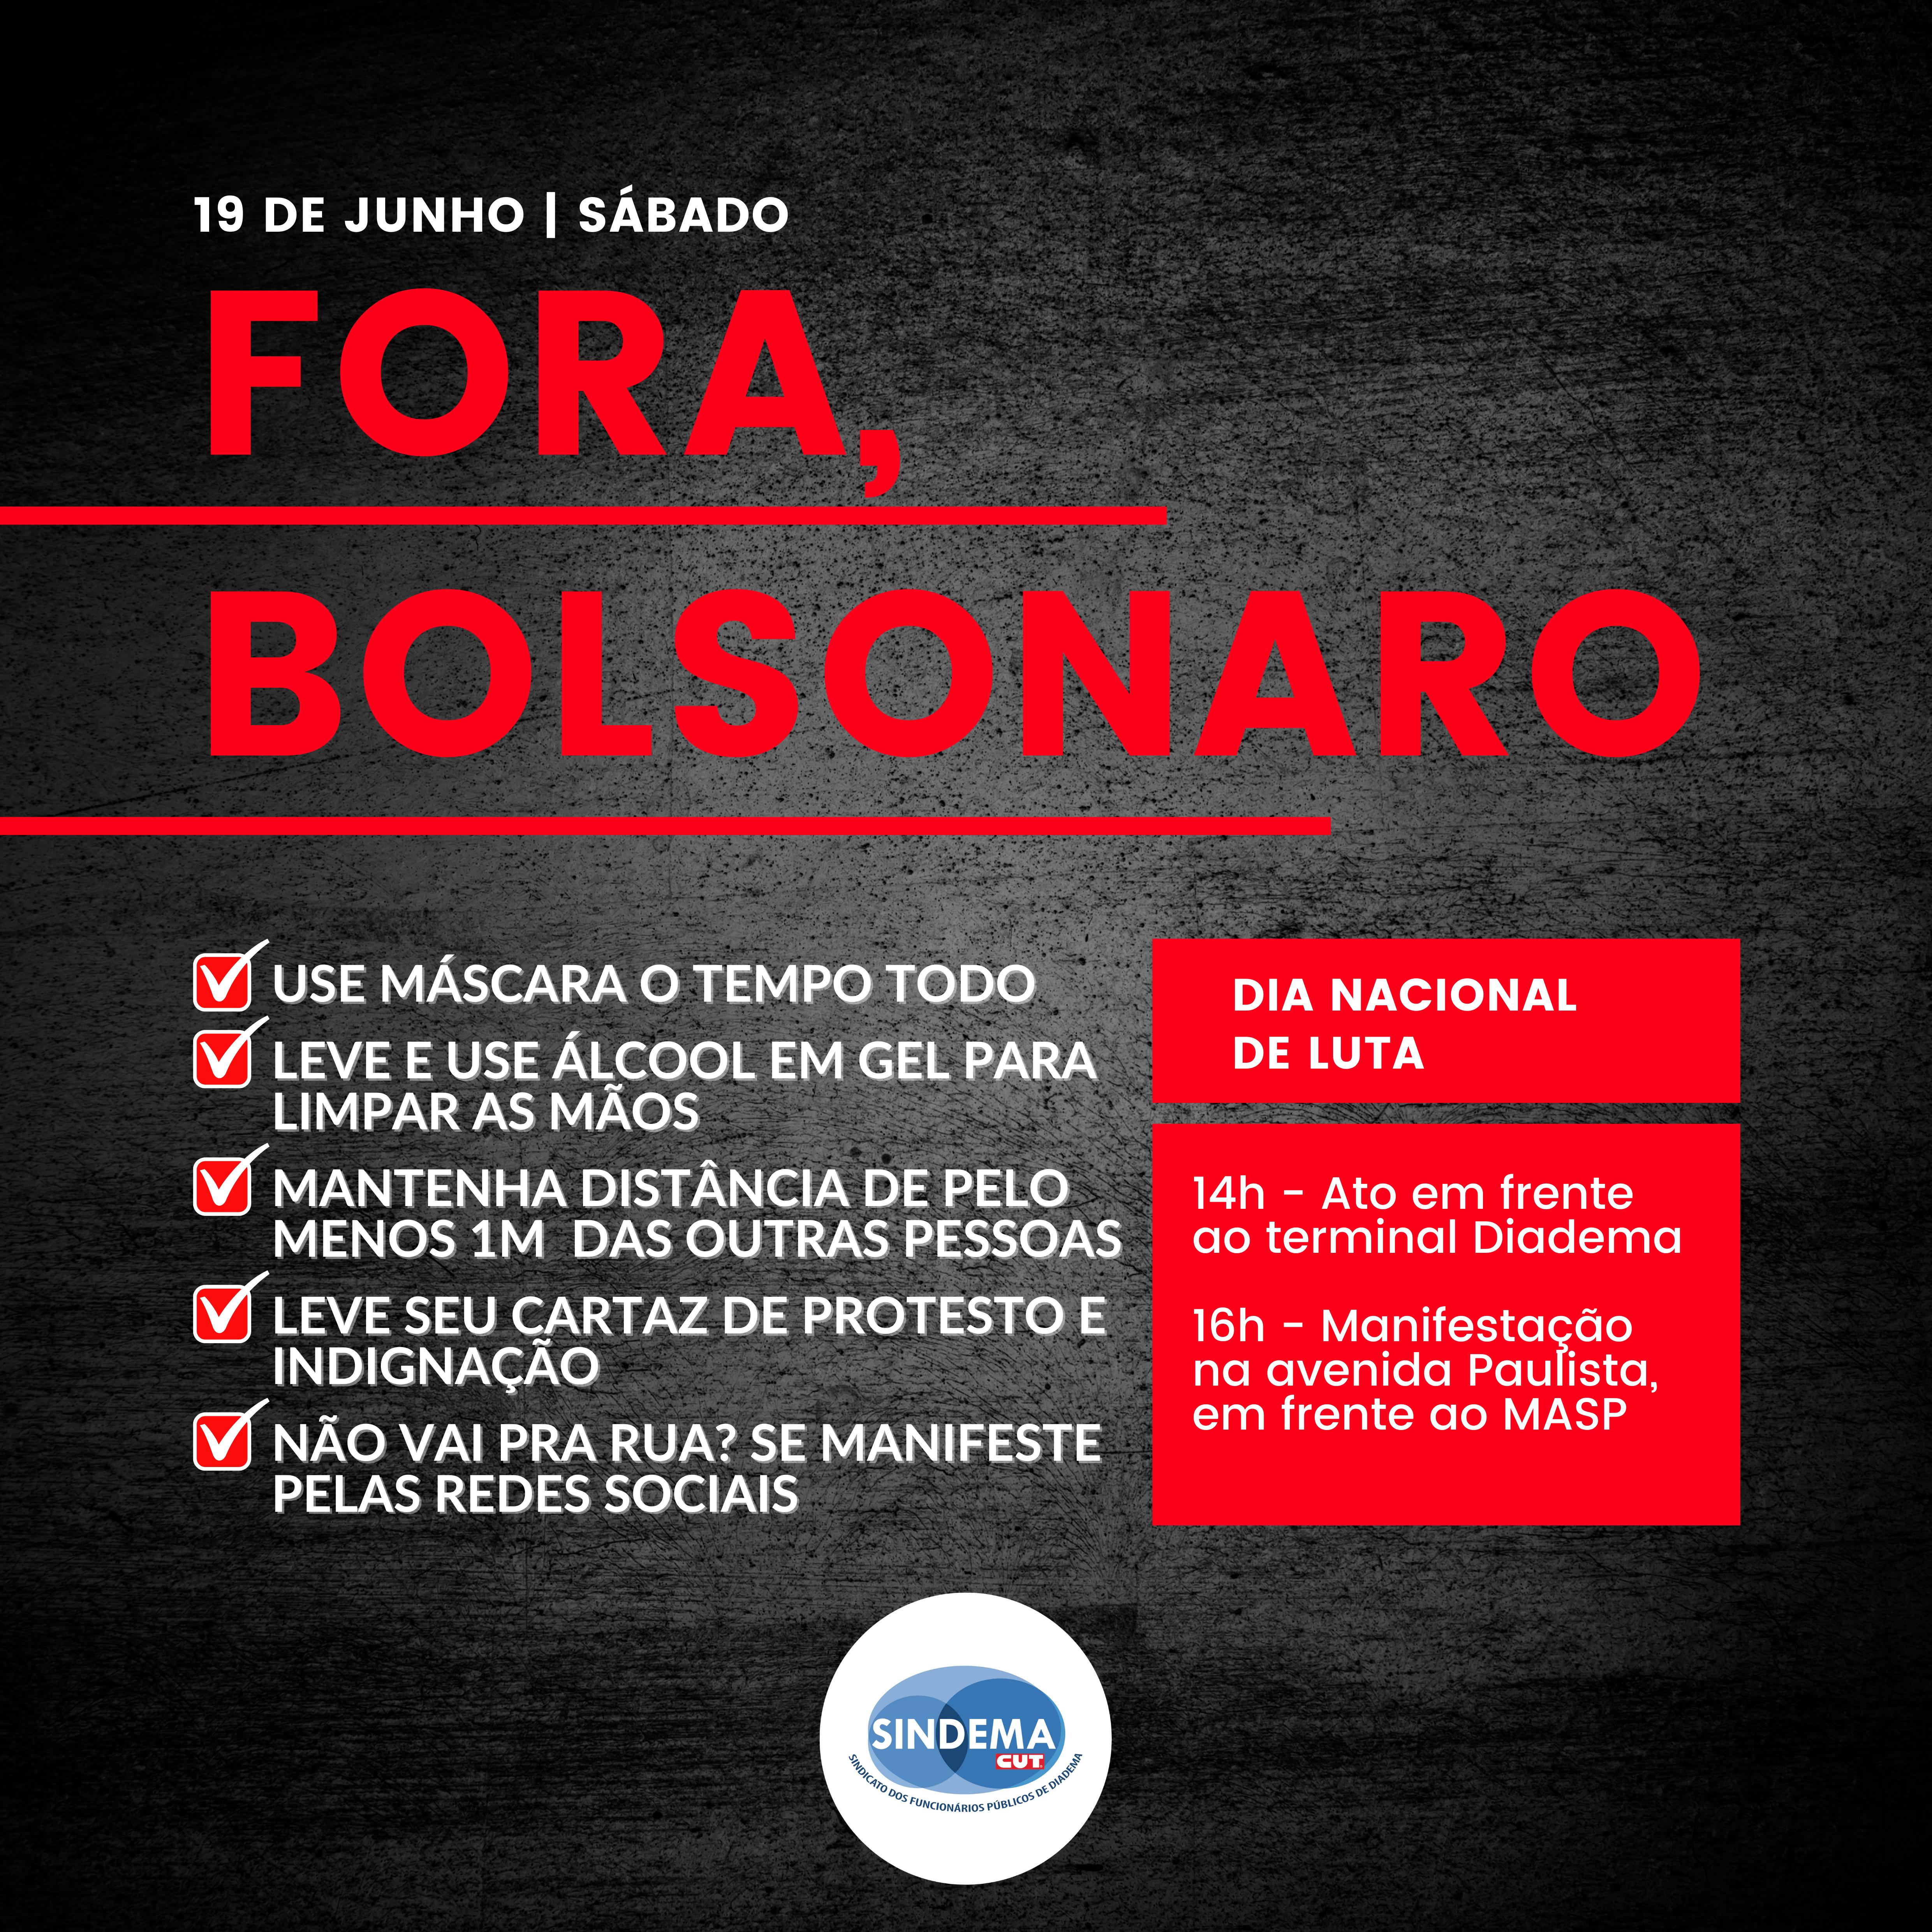 Fora, Bolsonaro!